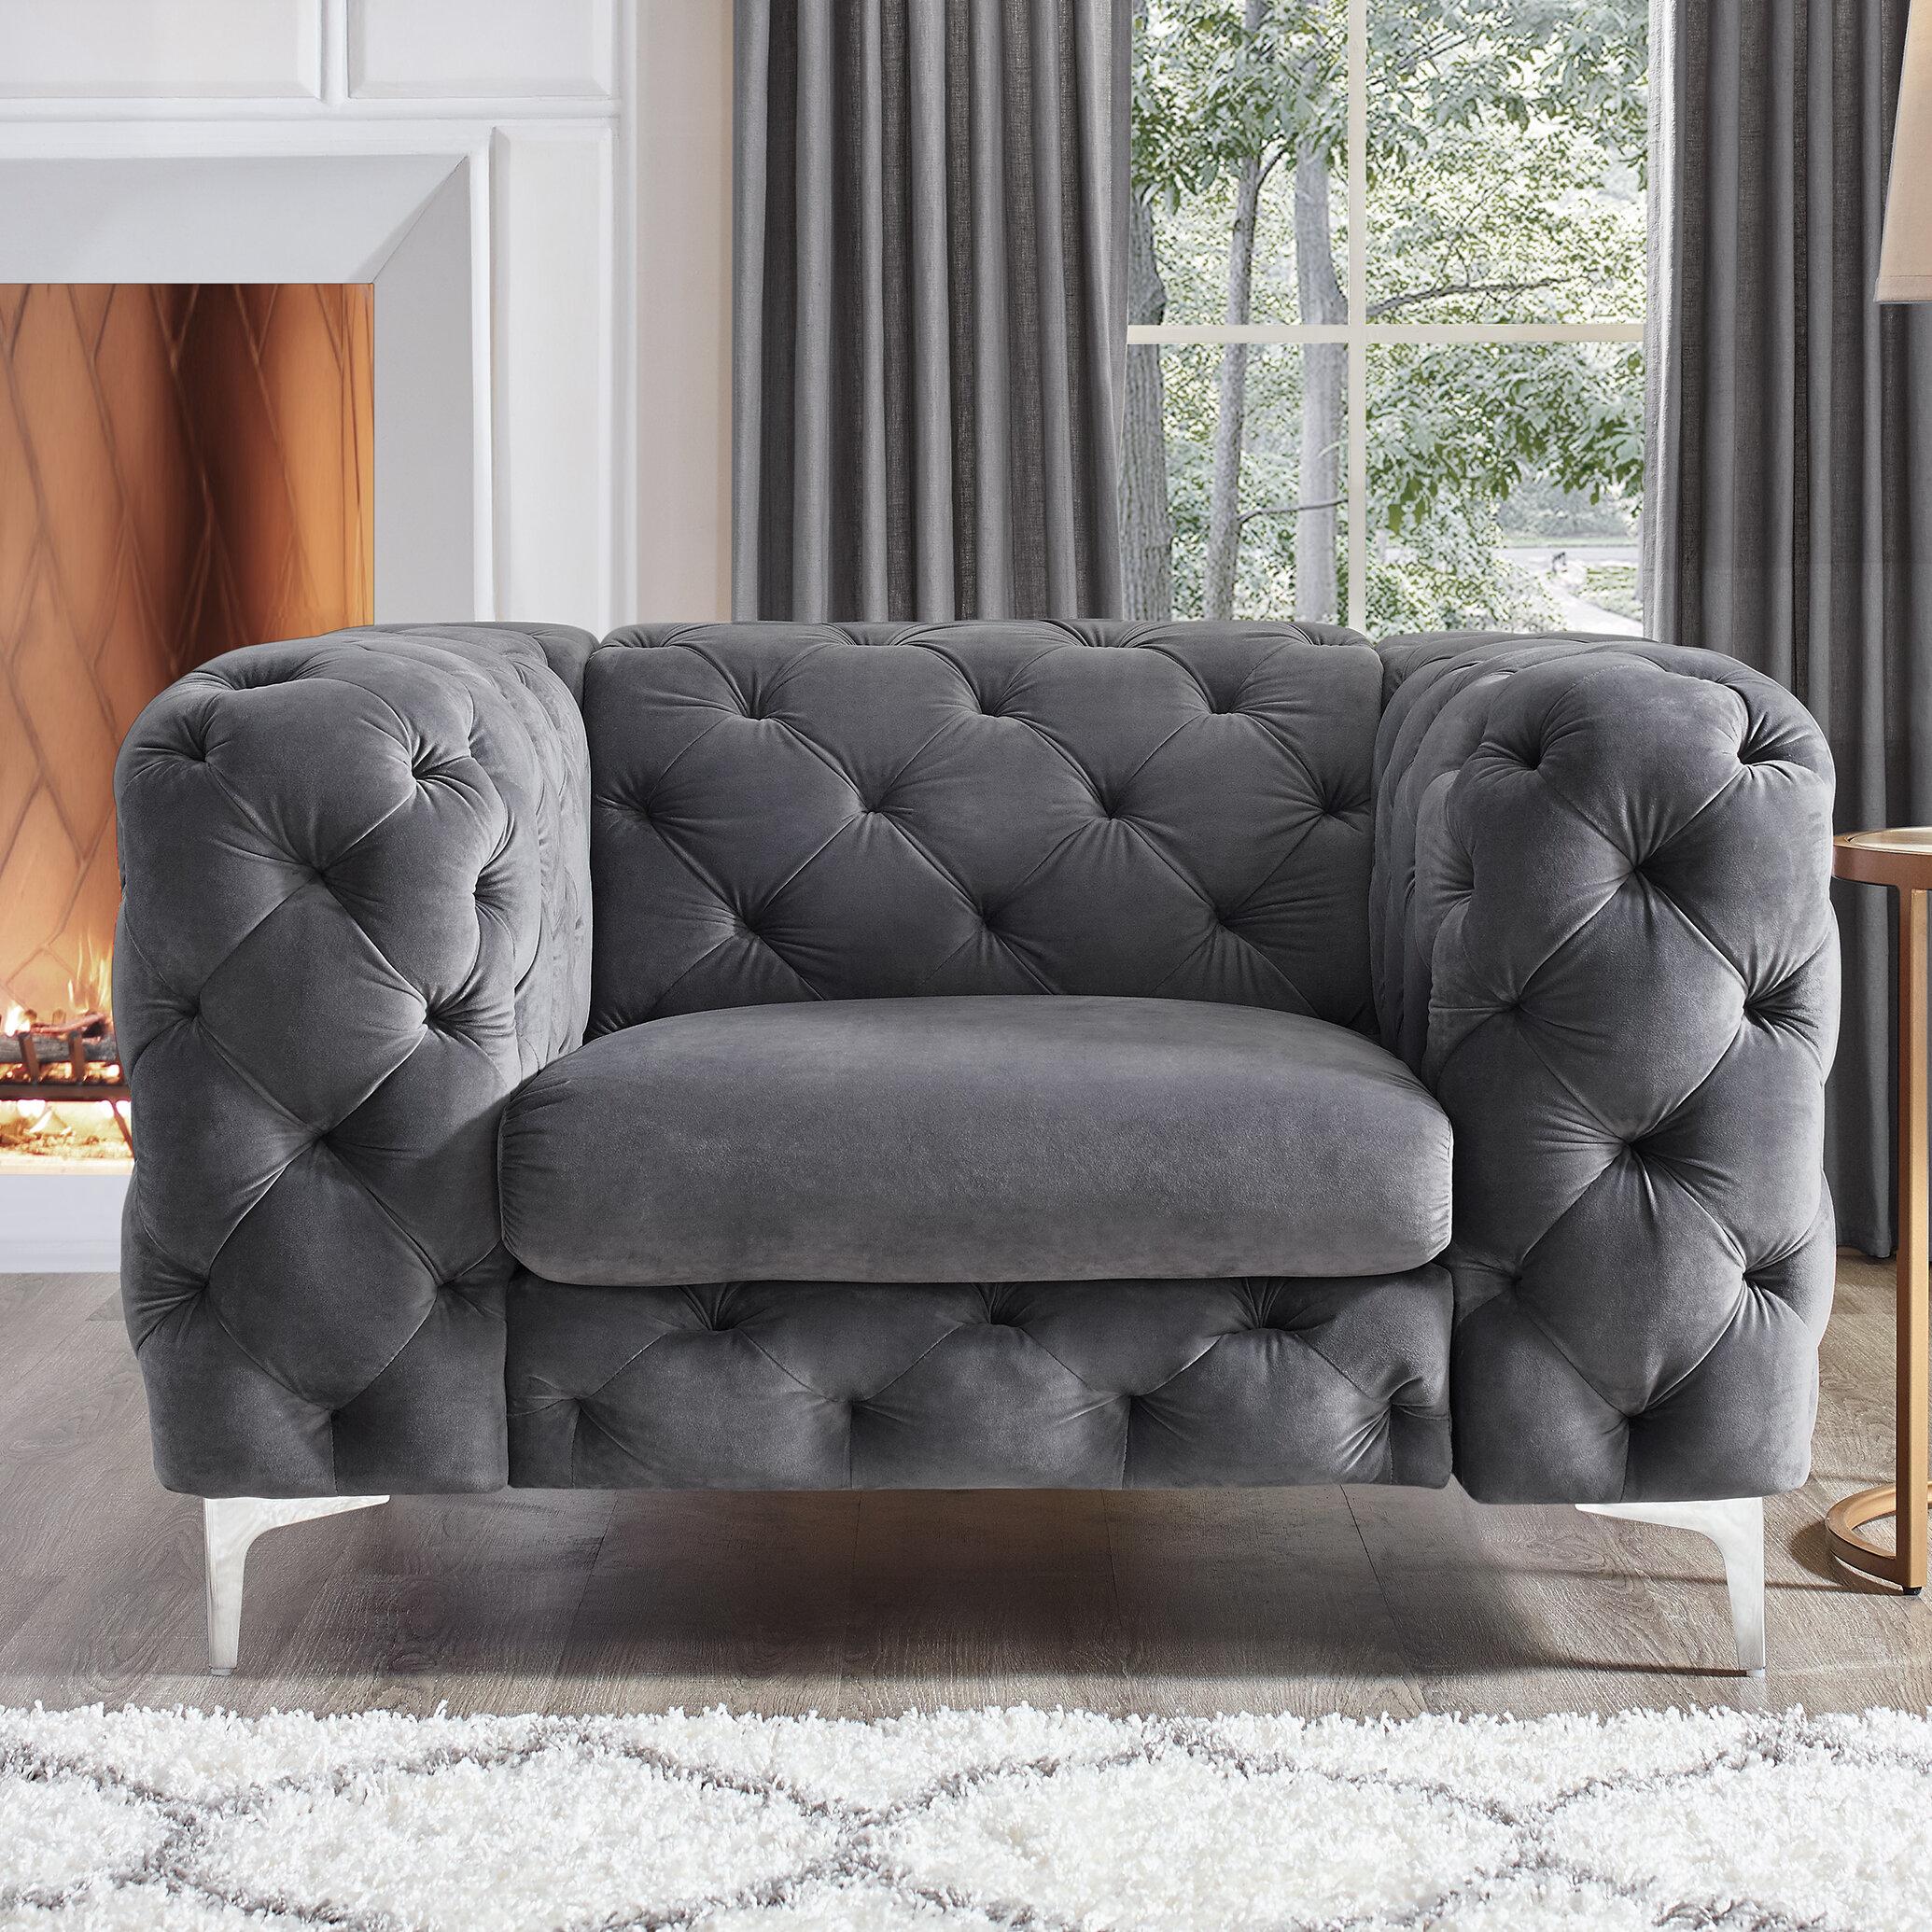 House of hampton kogan chesterfield chair reviews wayfair